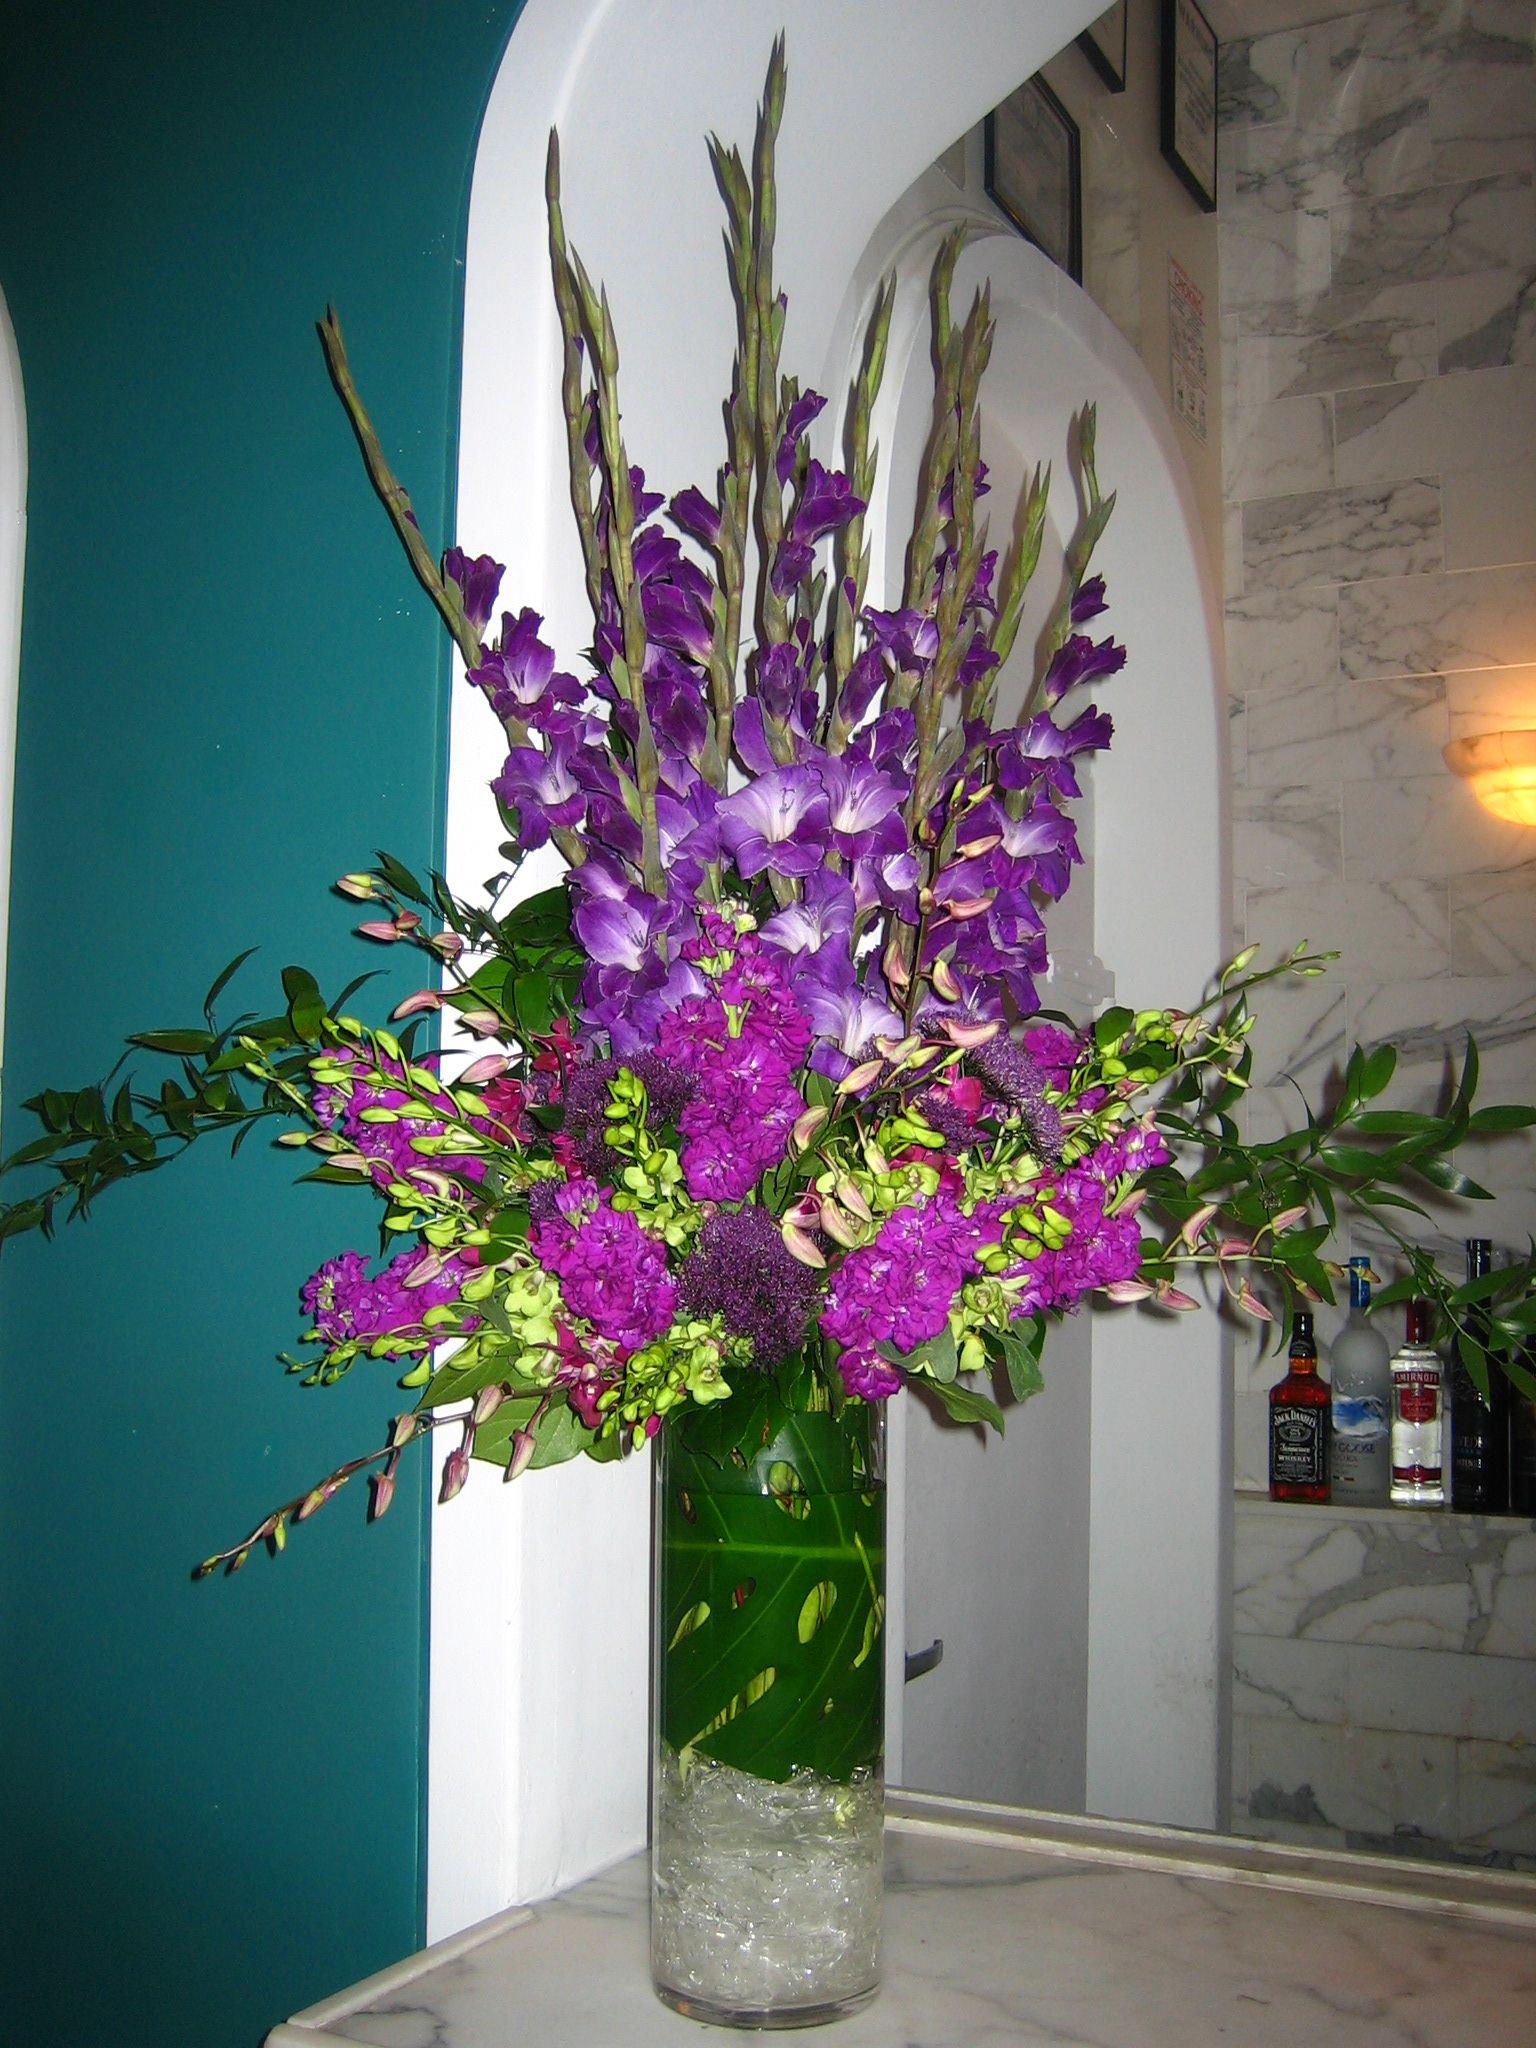 gladiolus has been dubbed the flower of the gladiators description rh pinterest com